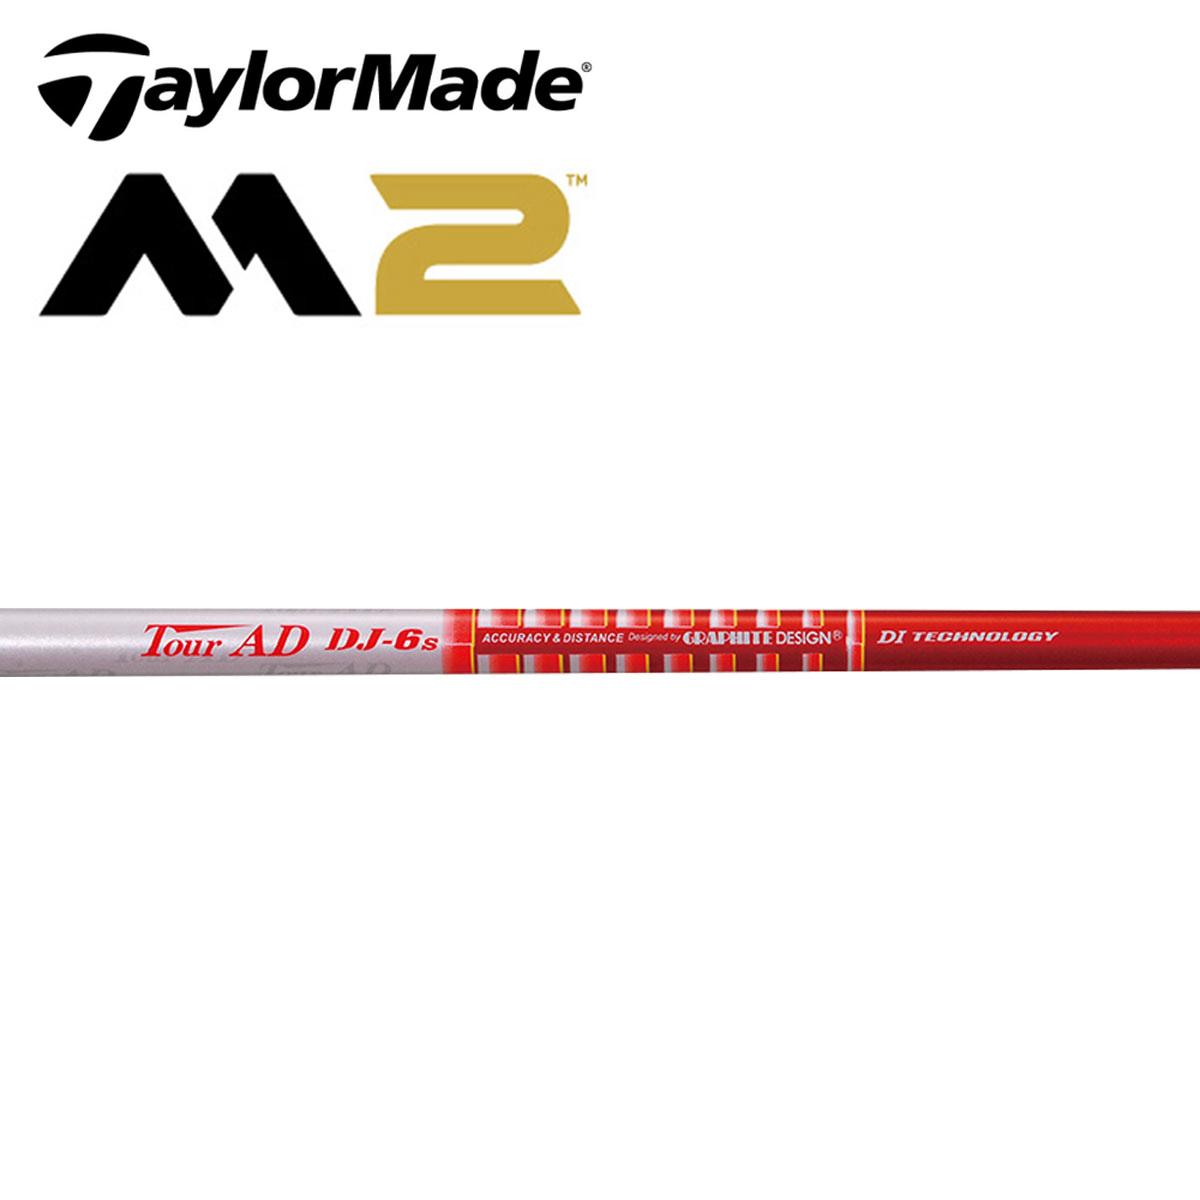 Tour AD DJシリーズ M2 ドライバーロフト10.5度用スリーブ付きシャフト 2016年モデル【テーラーメイド専用】